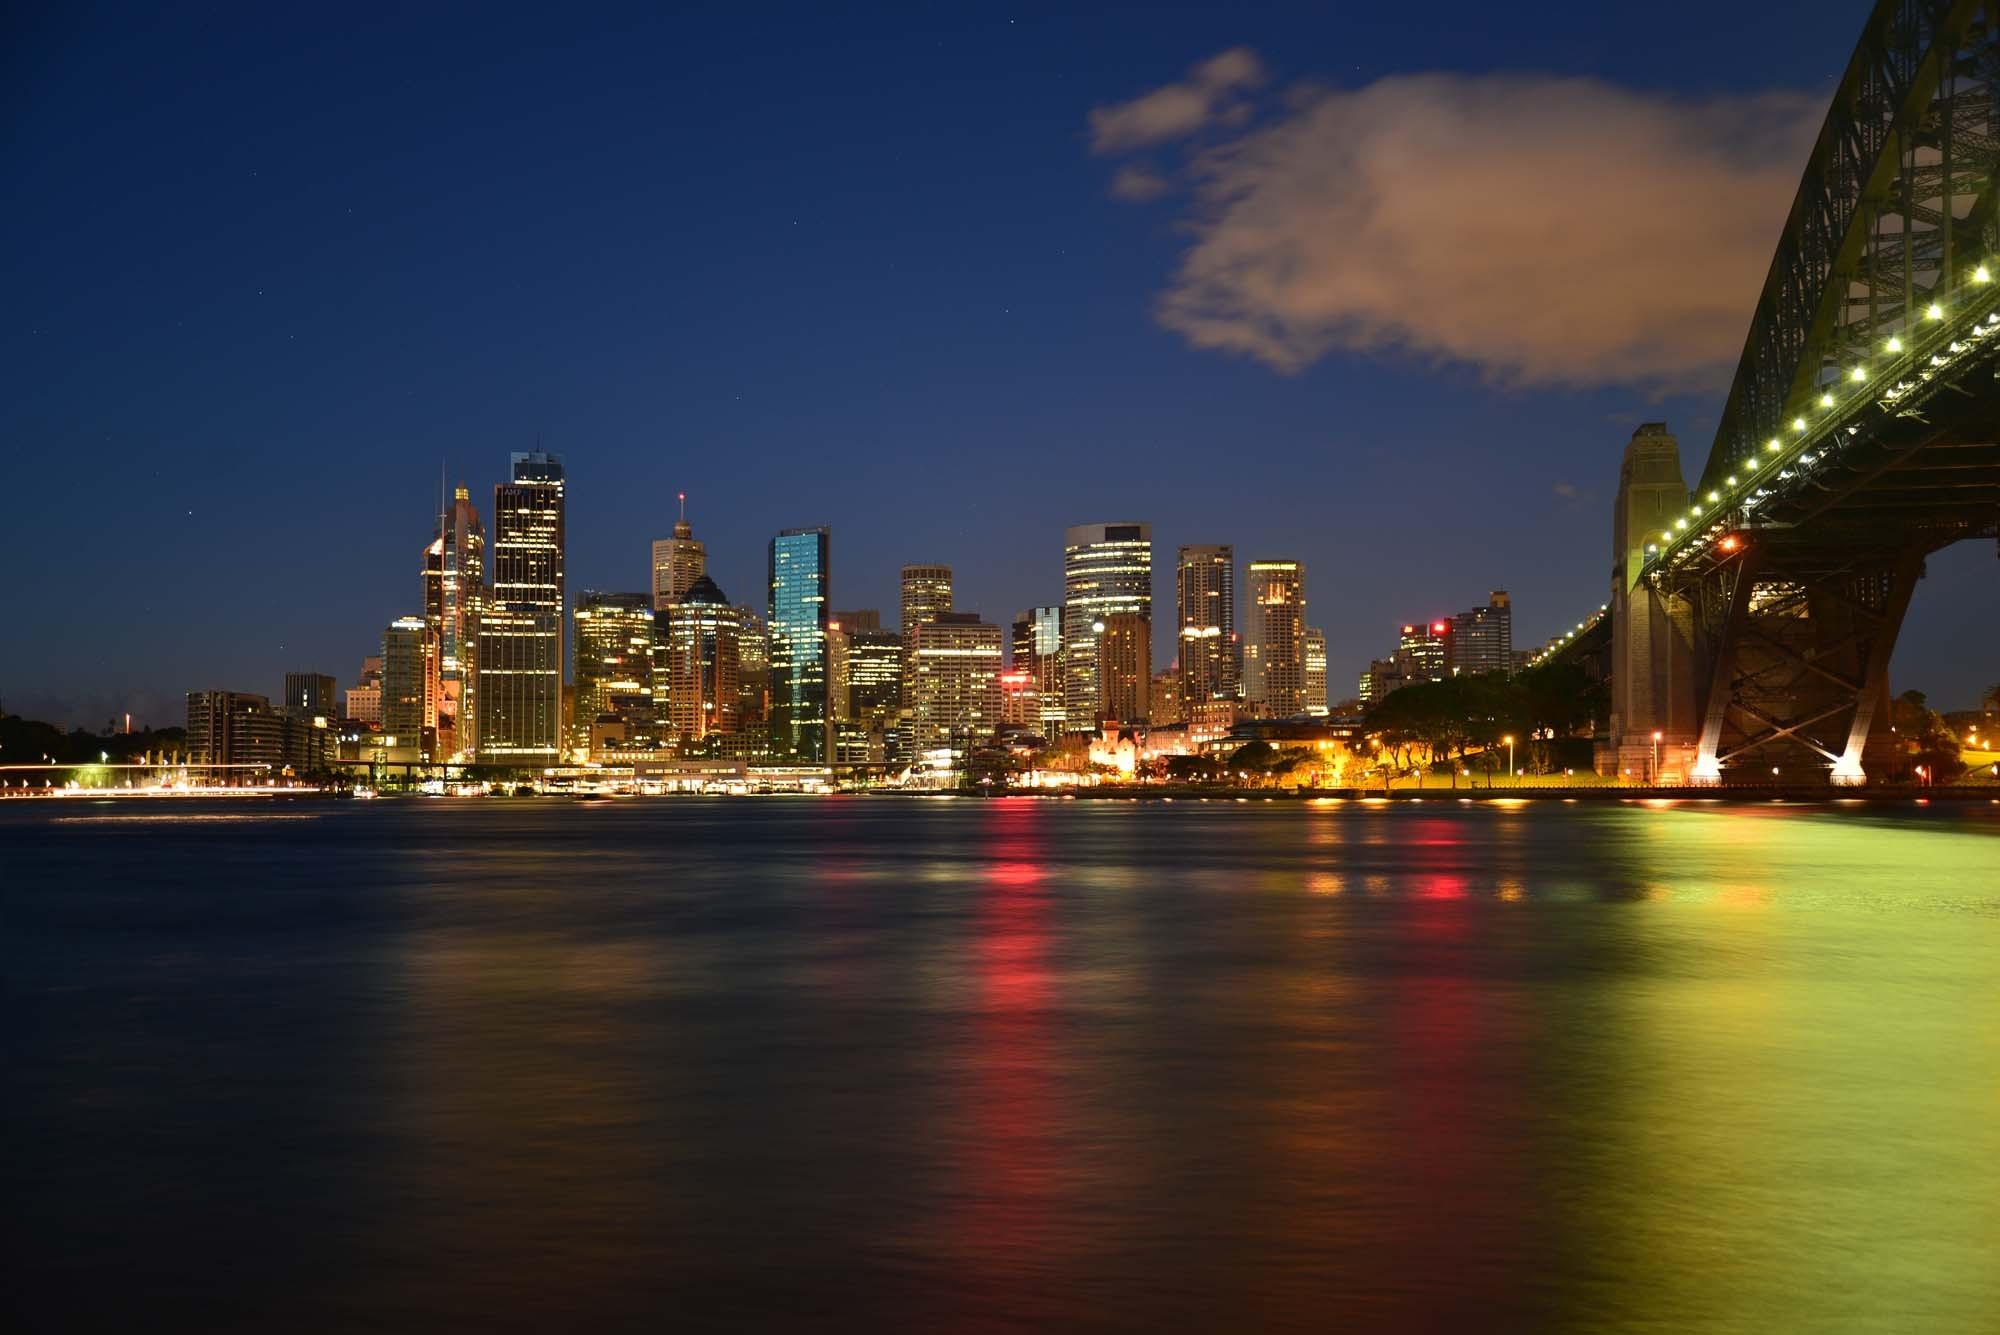 milsons-point-sydney-australia-sydney-opera-house-57389